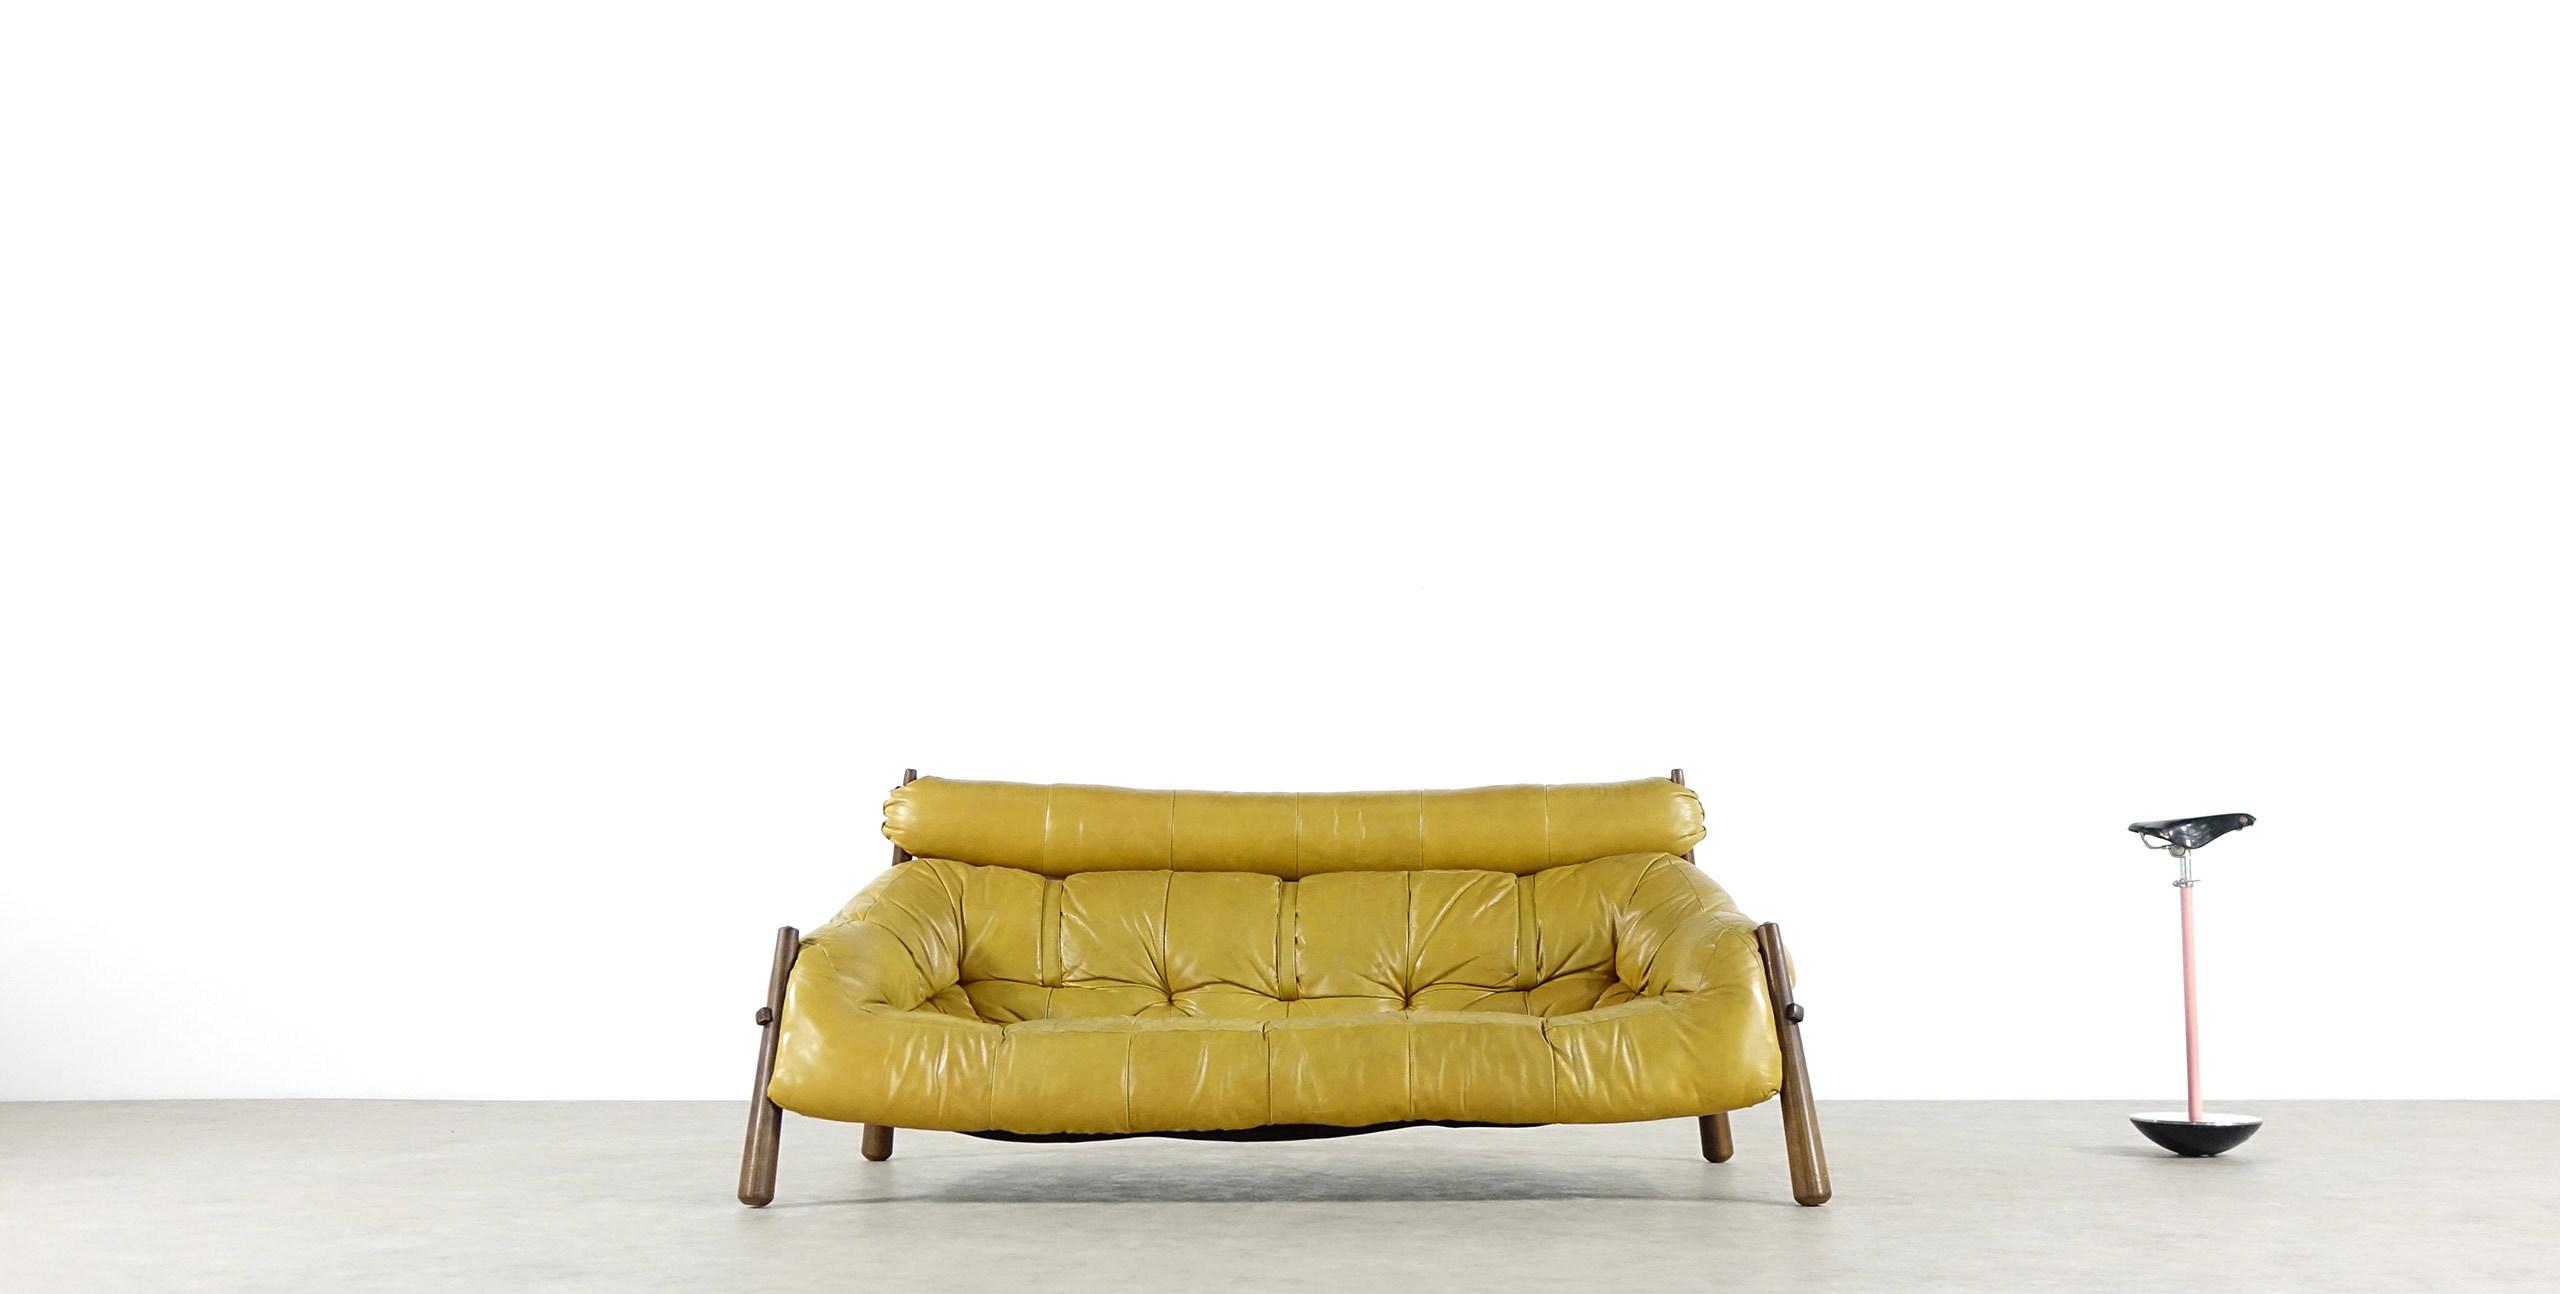 Astounding Percival Lafer Brazilian Lounge Chair Sofa Zorrobot Ibusinesslaw Wood Chair Design Ideas Ibusinesslaworg